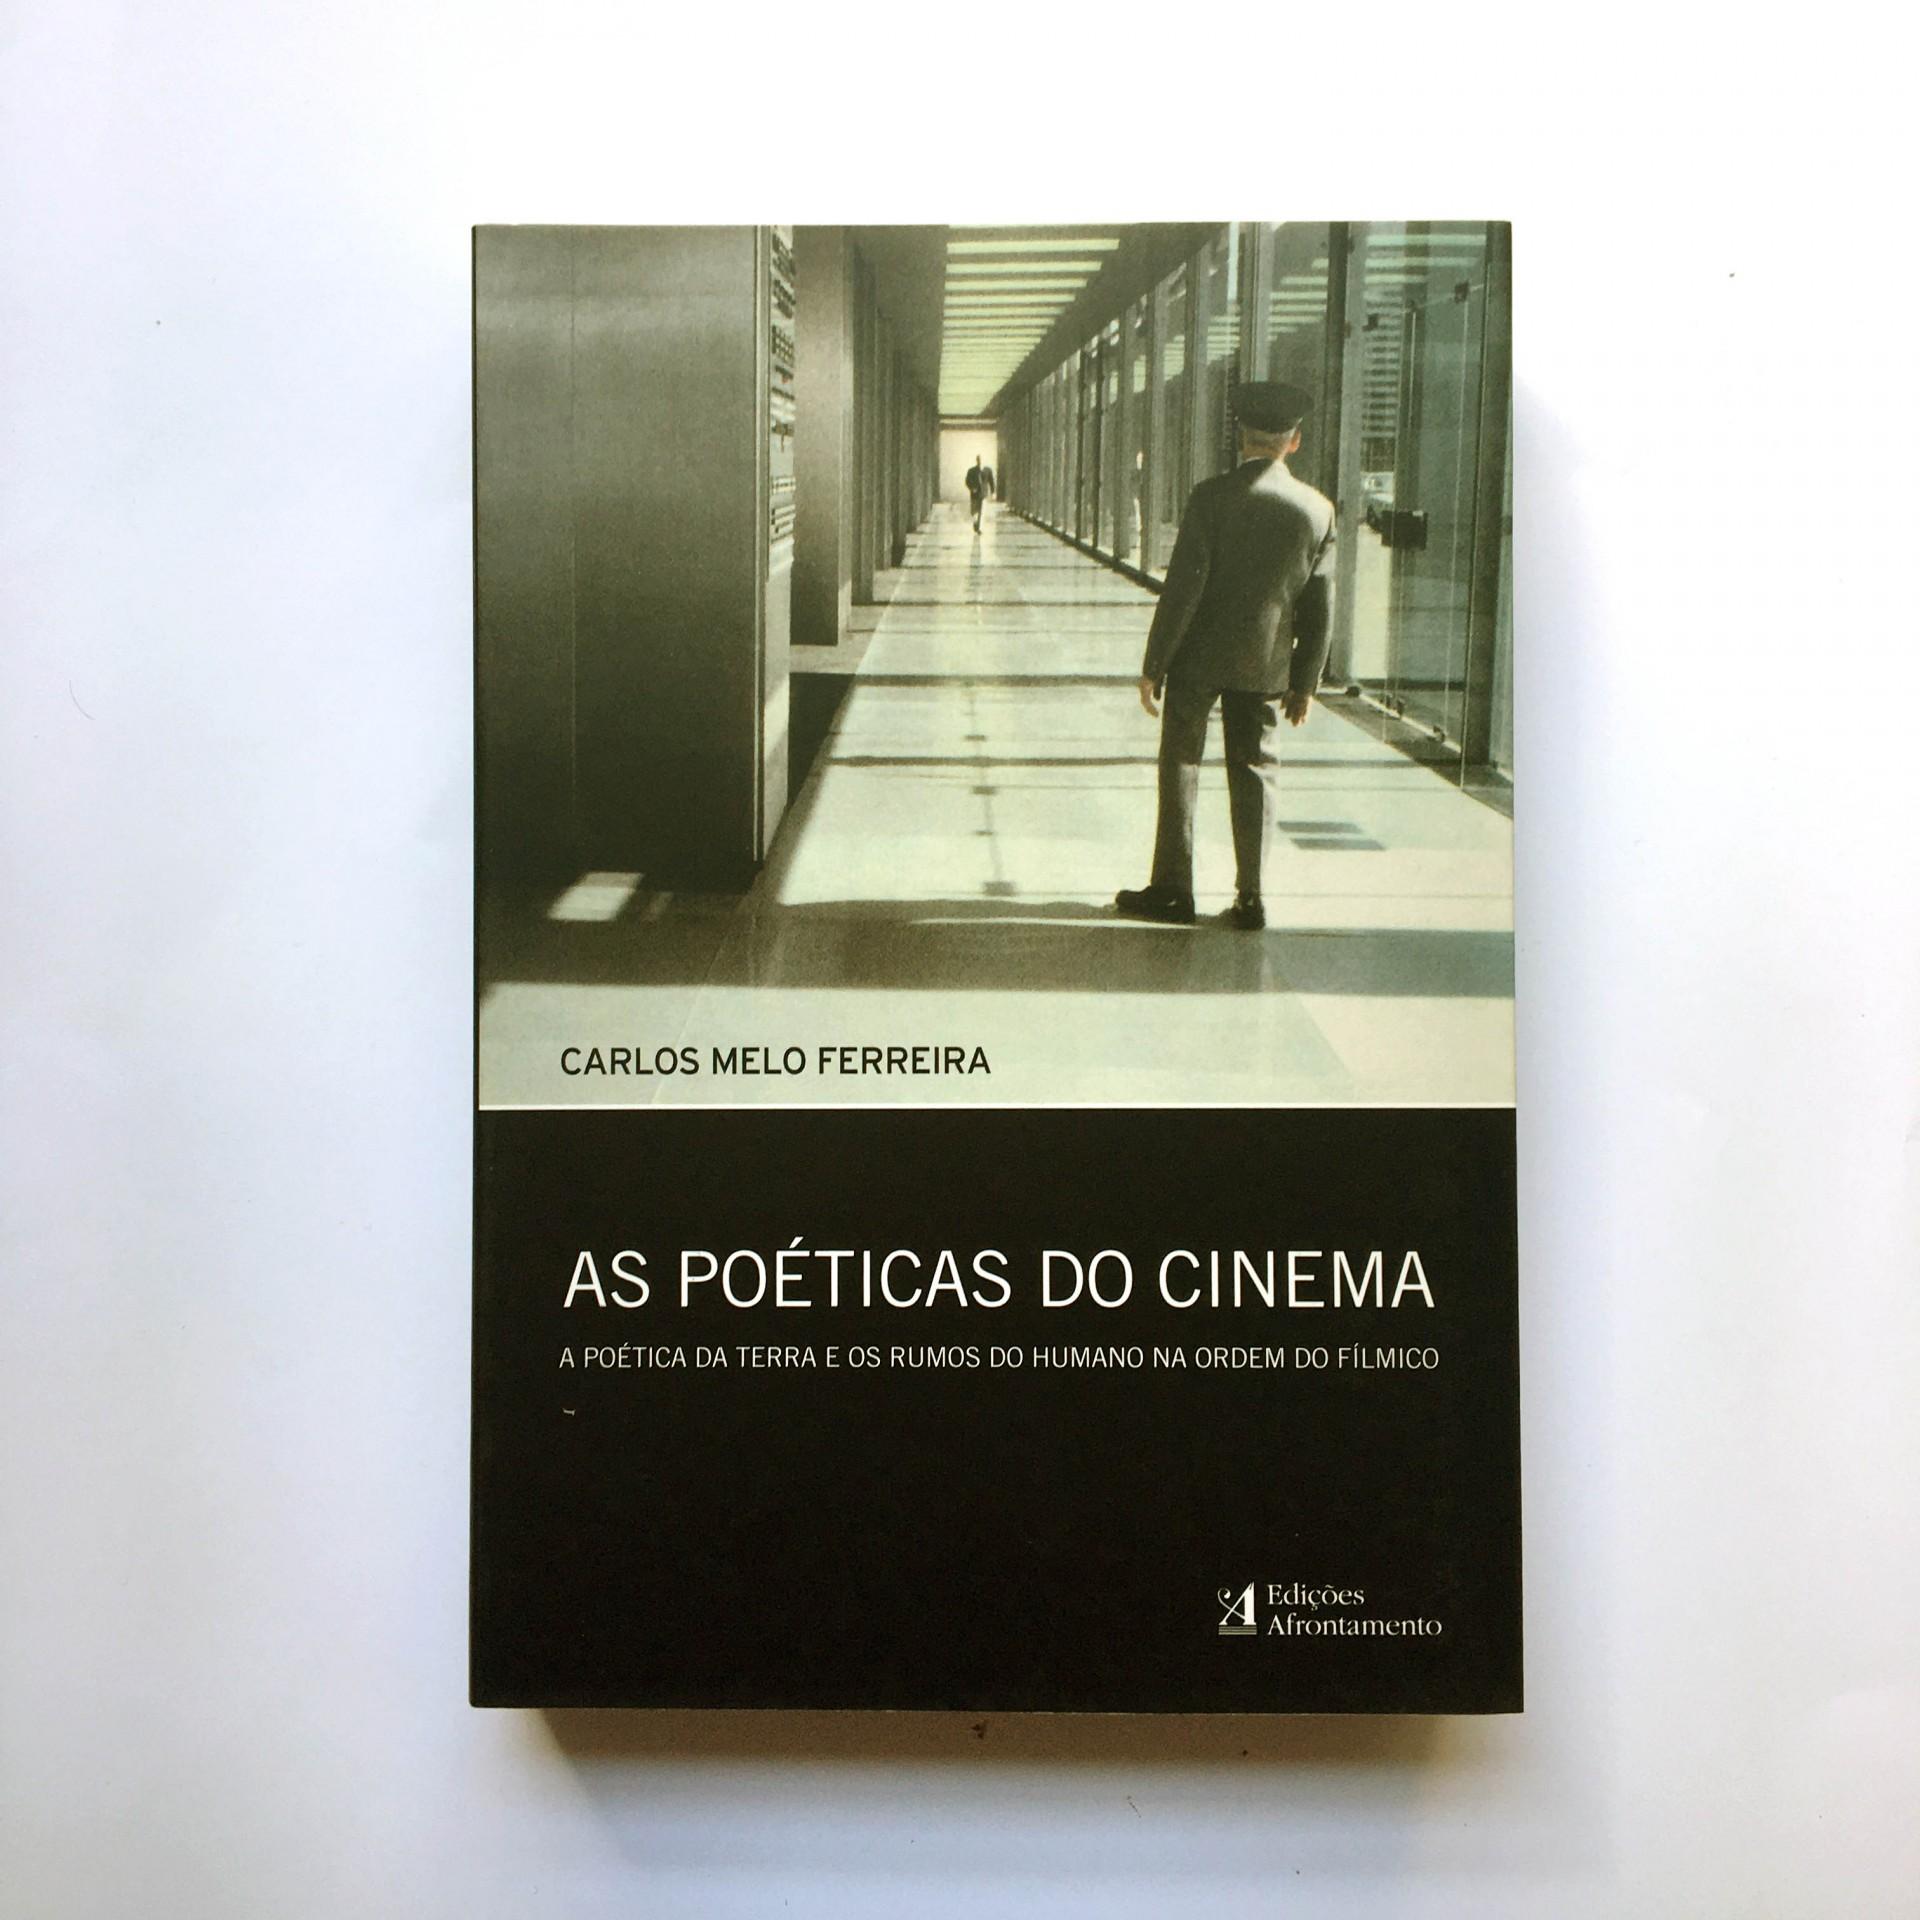 As poéticas do cinema. A poética da terra e os rumos do humano na ordem do fílmico